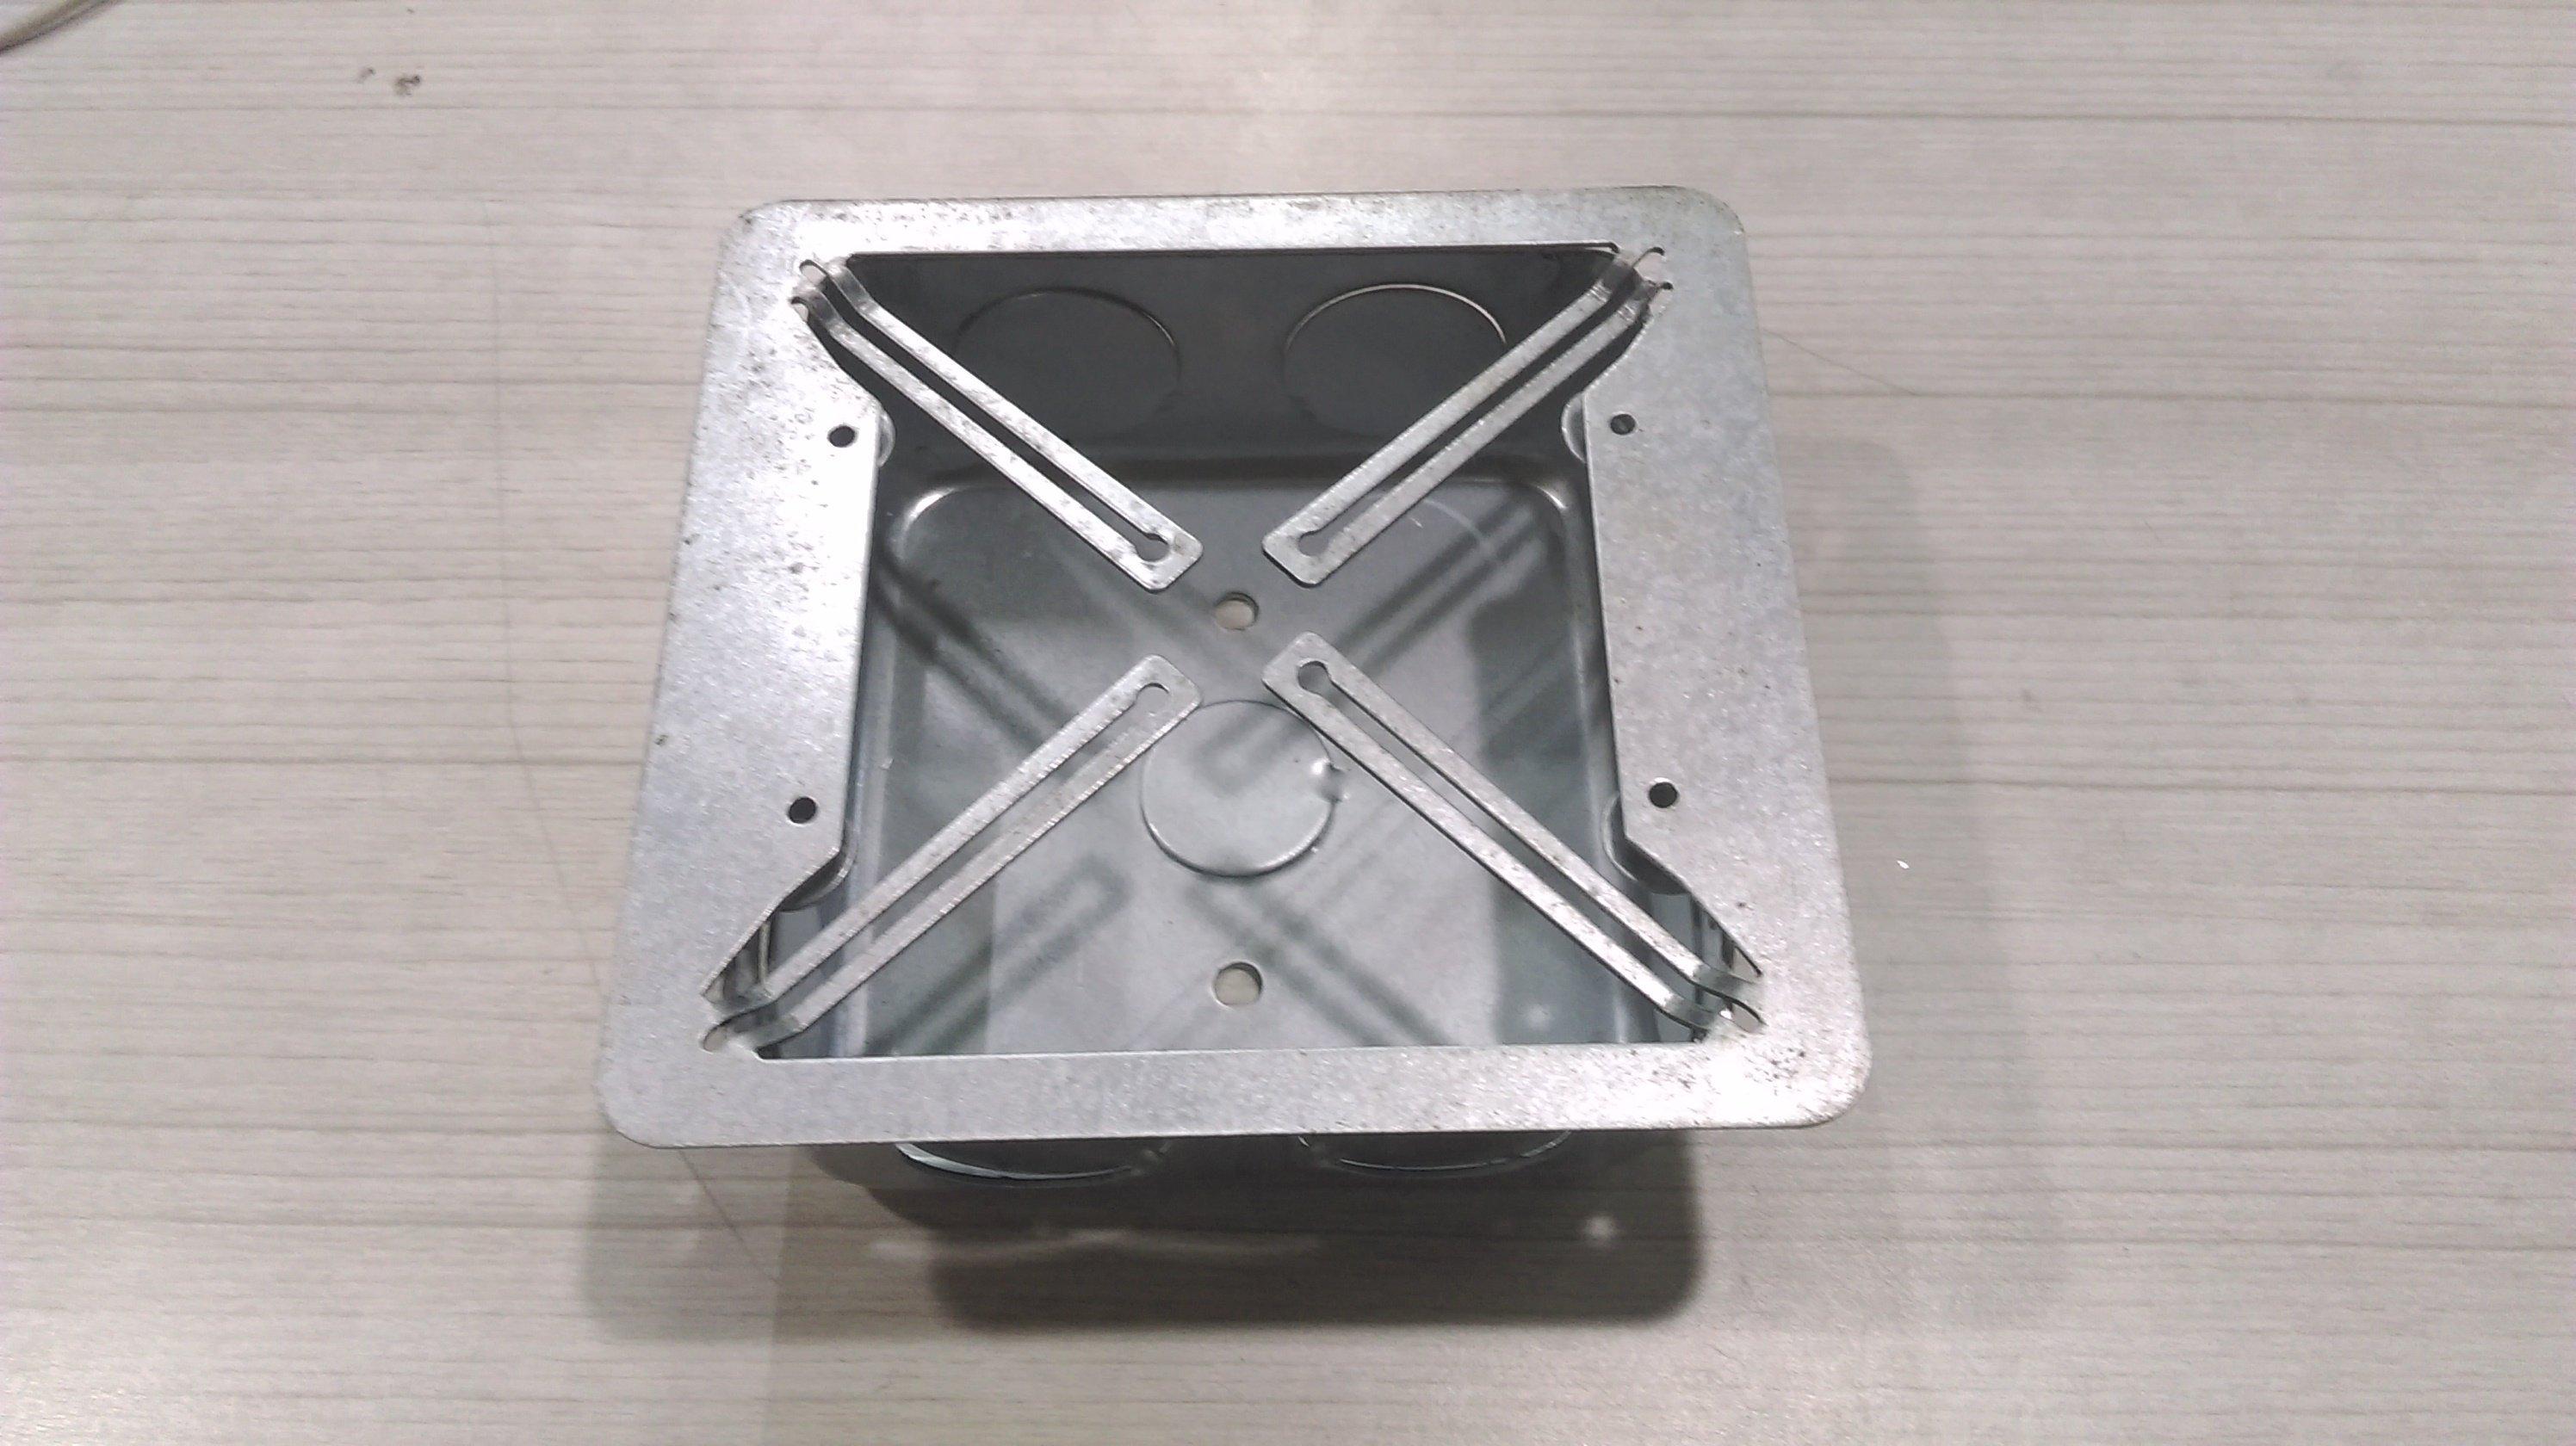 DIY水電材料 兩聯式鐵盒斷耳修補片 開關插座蓋板螺絲固定孔年久斷裂 無法固定 1片搞定 尺寸與蓋板相符